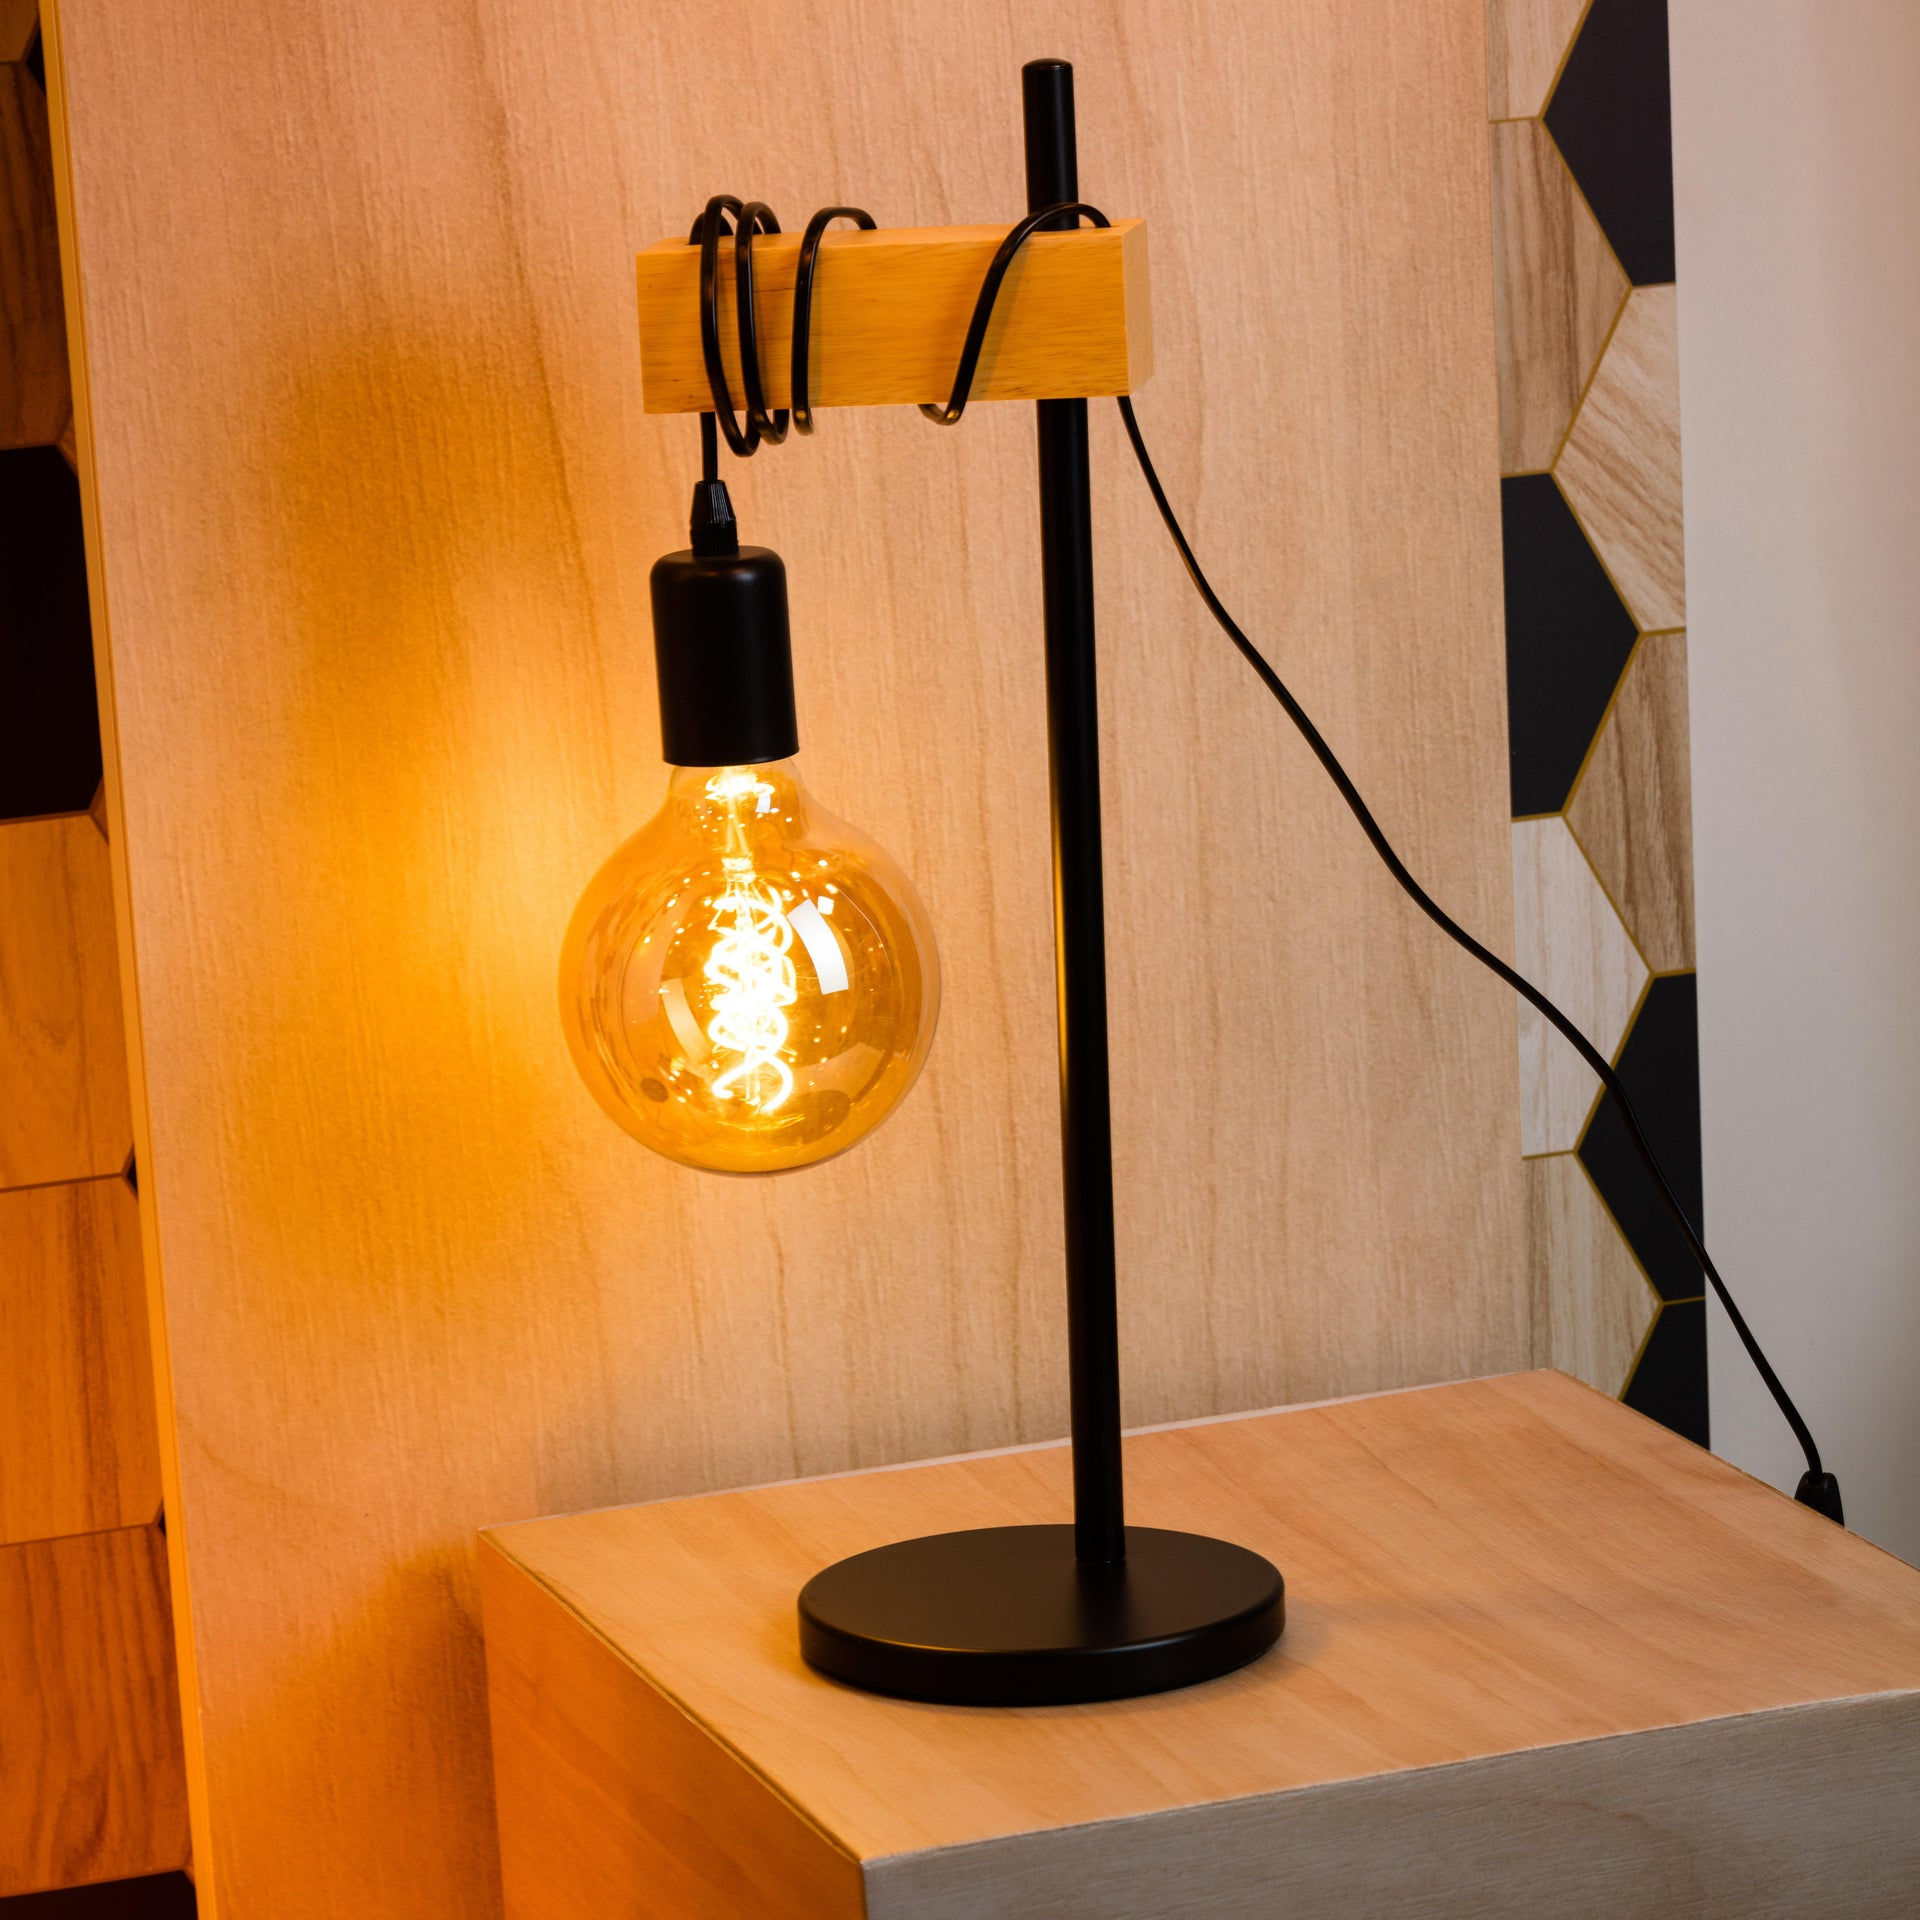 Lampada da tavolo Scandinavo Townshend nero , in metallo, EGLO - 2